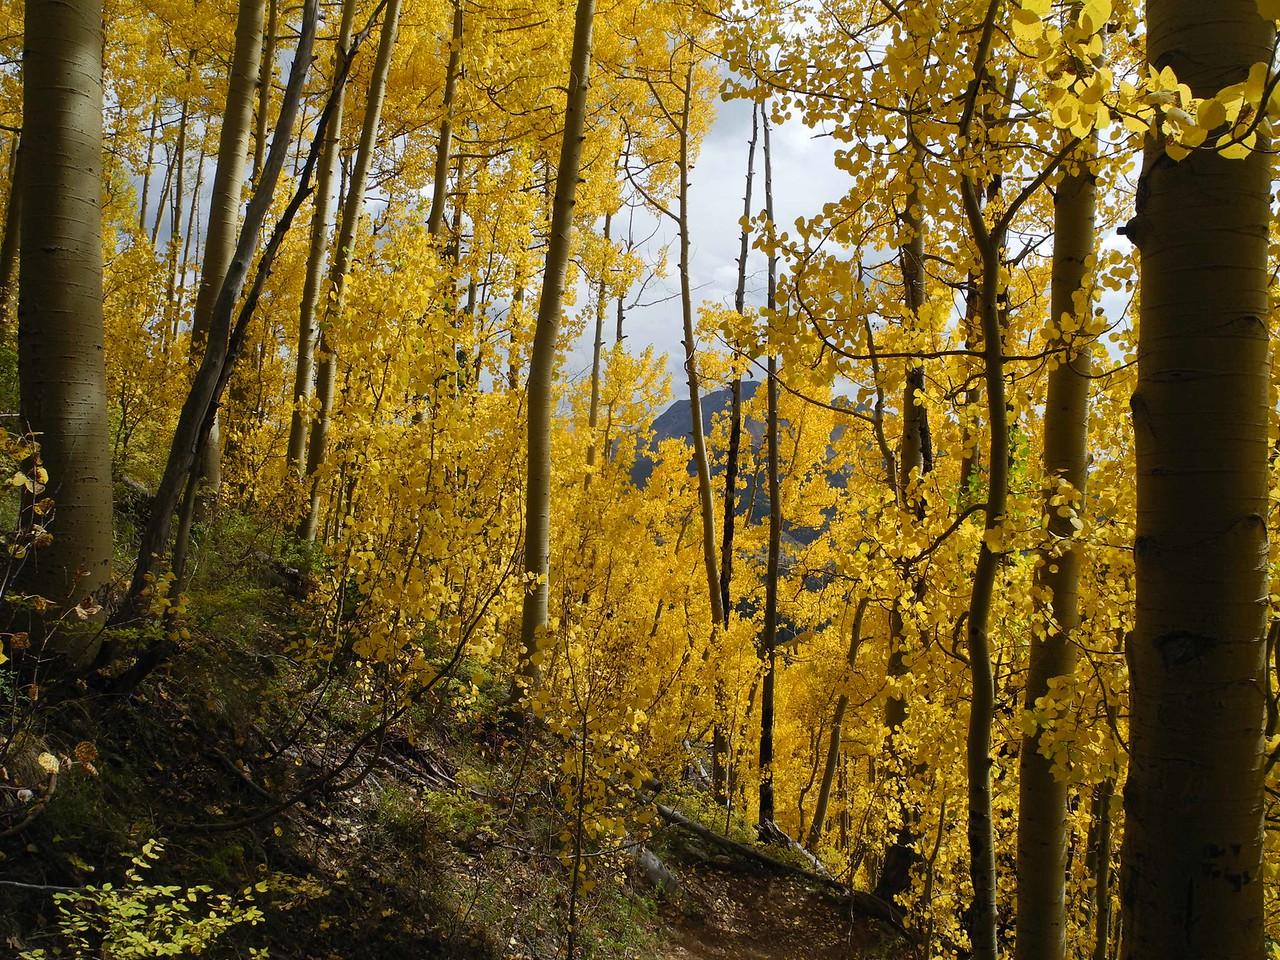 64 Within an aspen grove